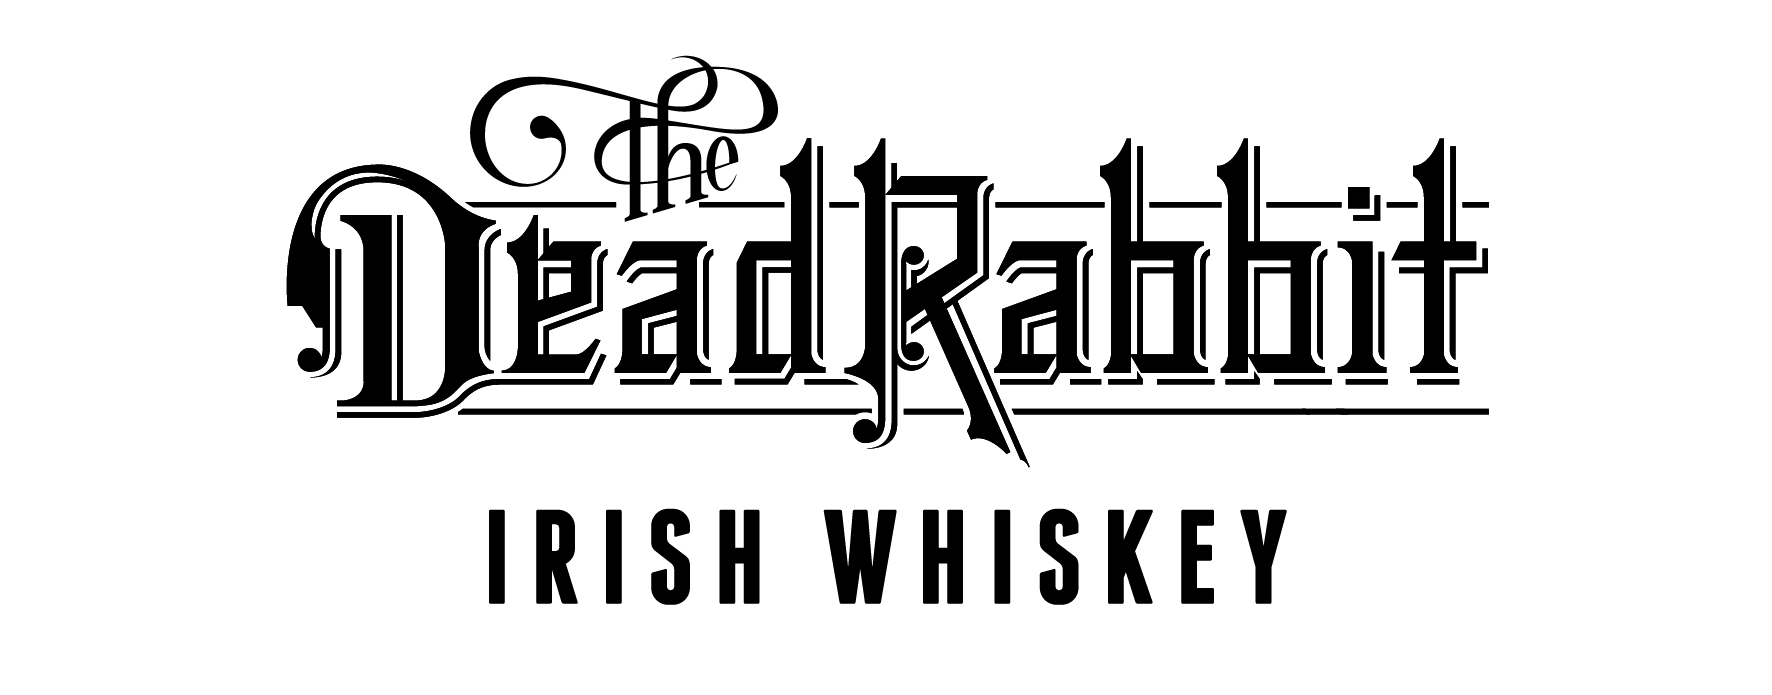 dead-rabbit-whiskey-logo